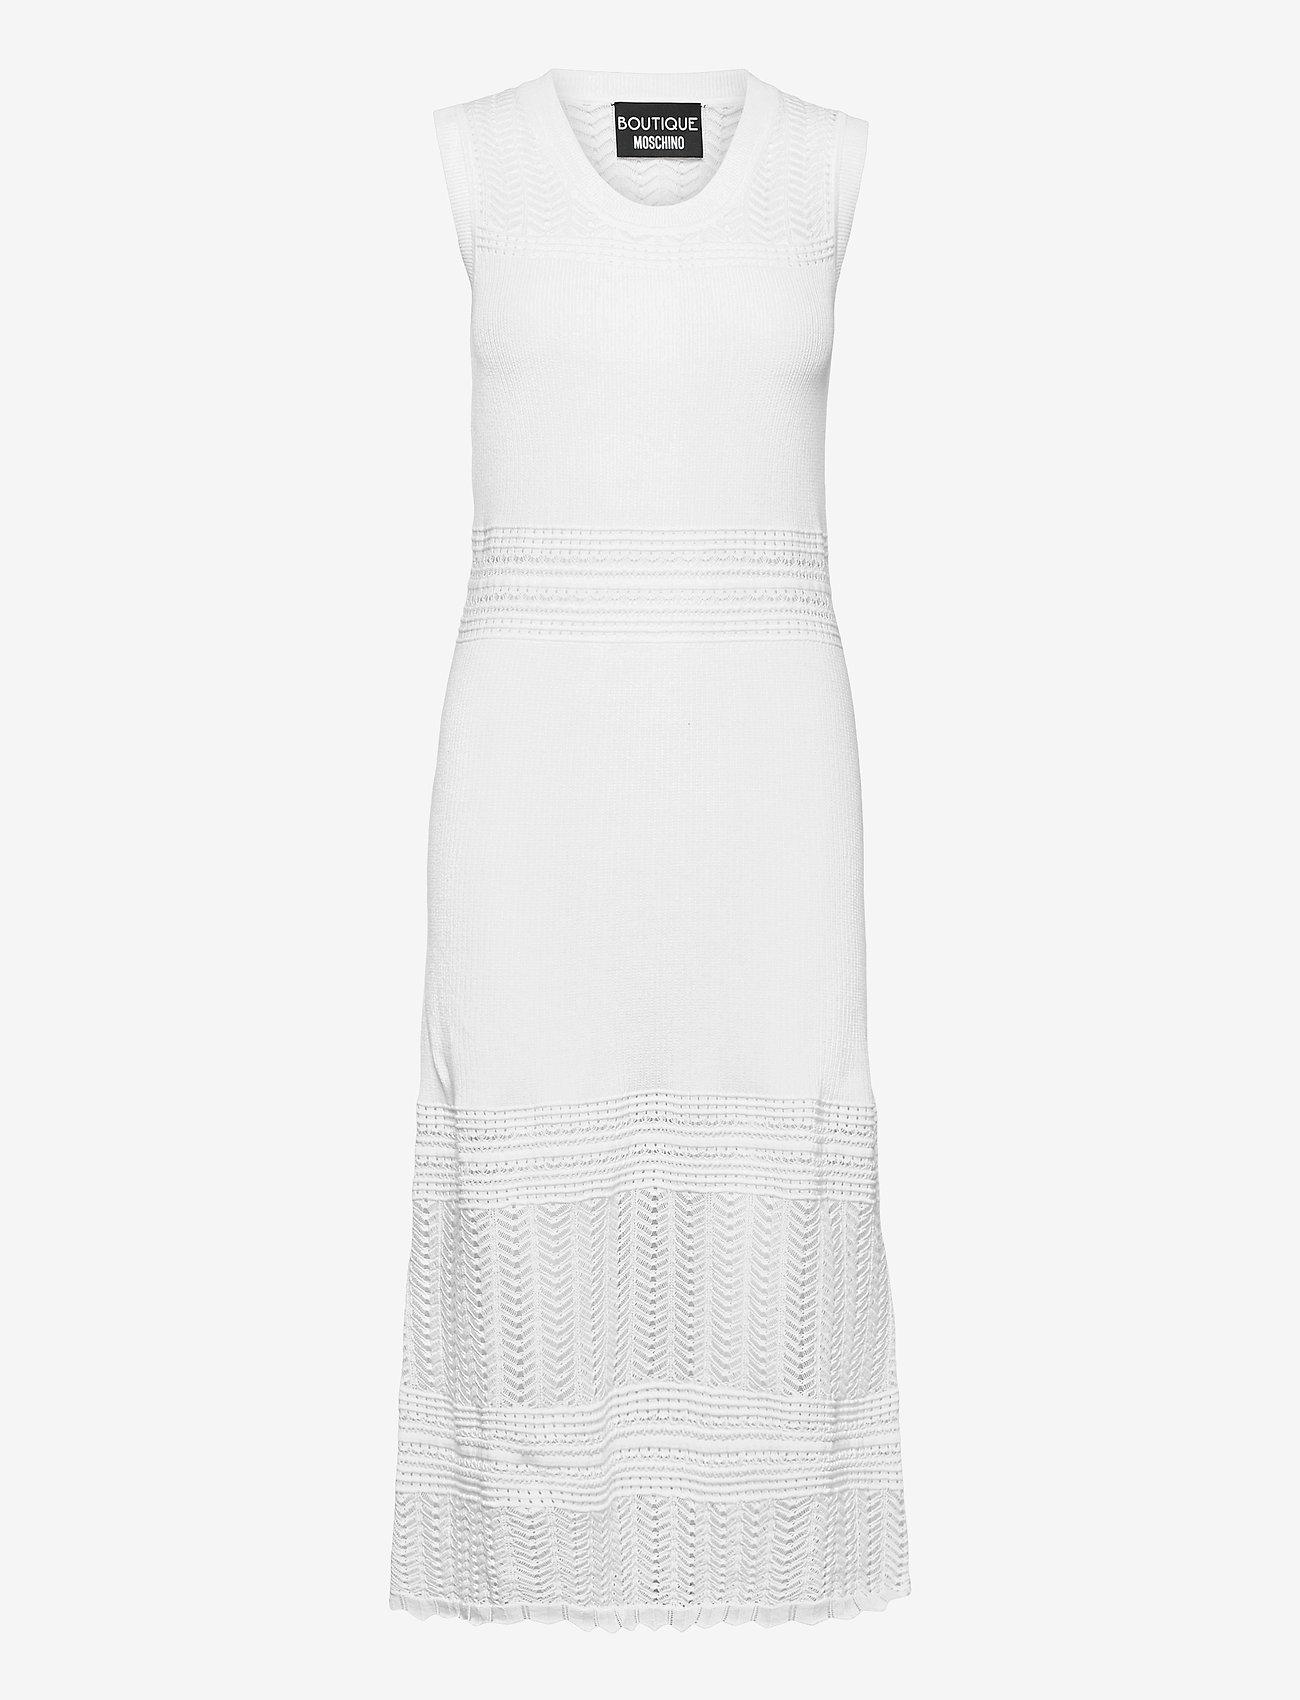 Boutique Moschino - Boutique Moschino LONG DRESS - sommerkjoler - white - 0